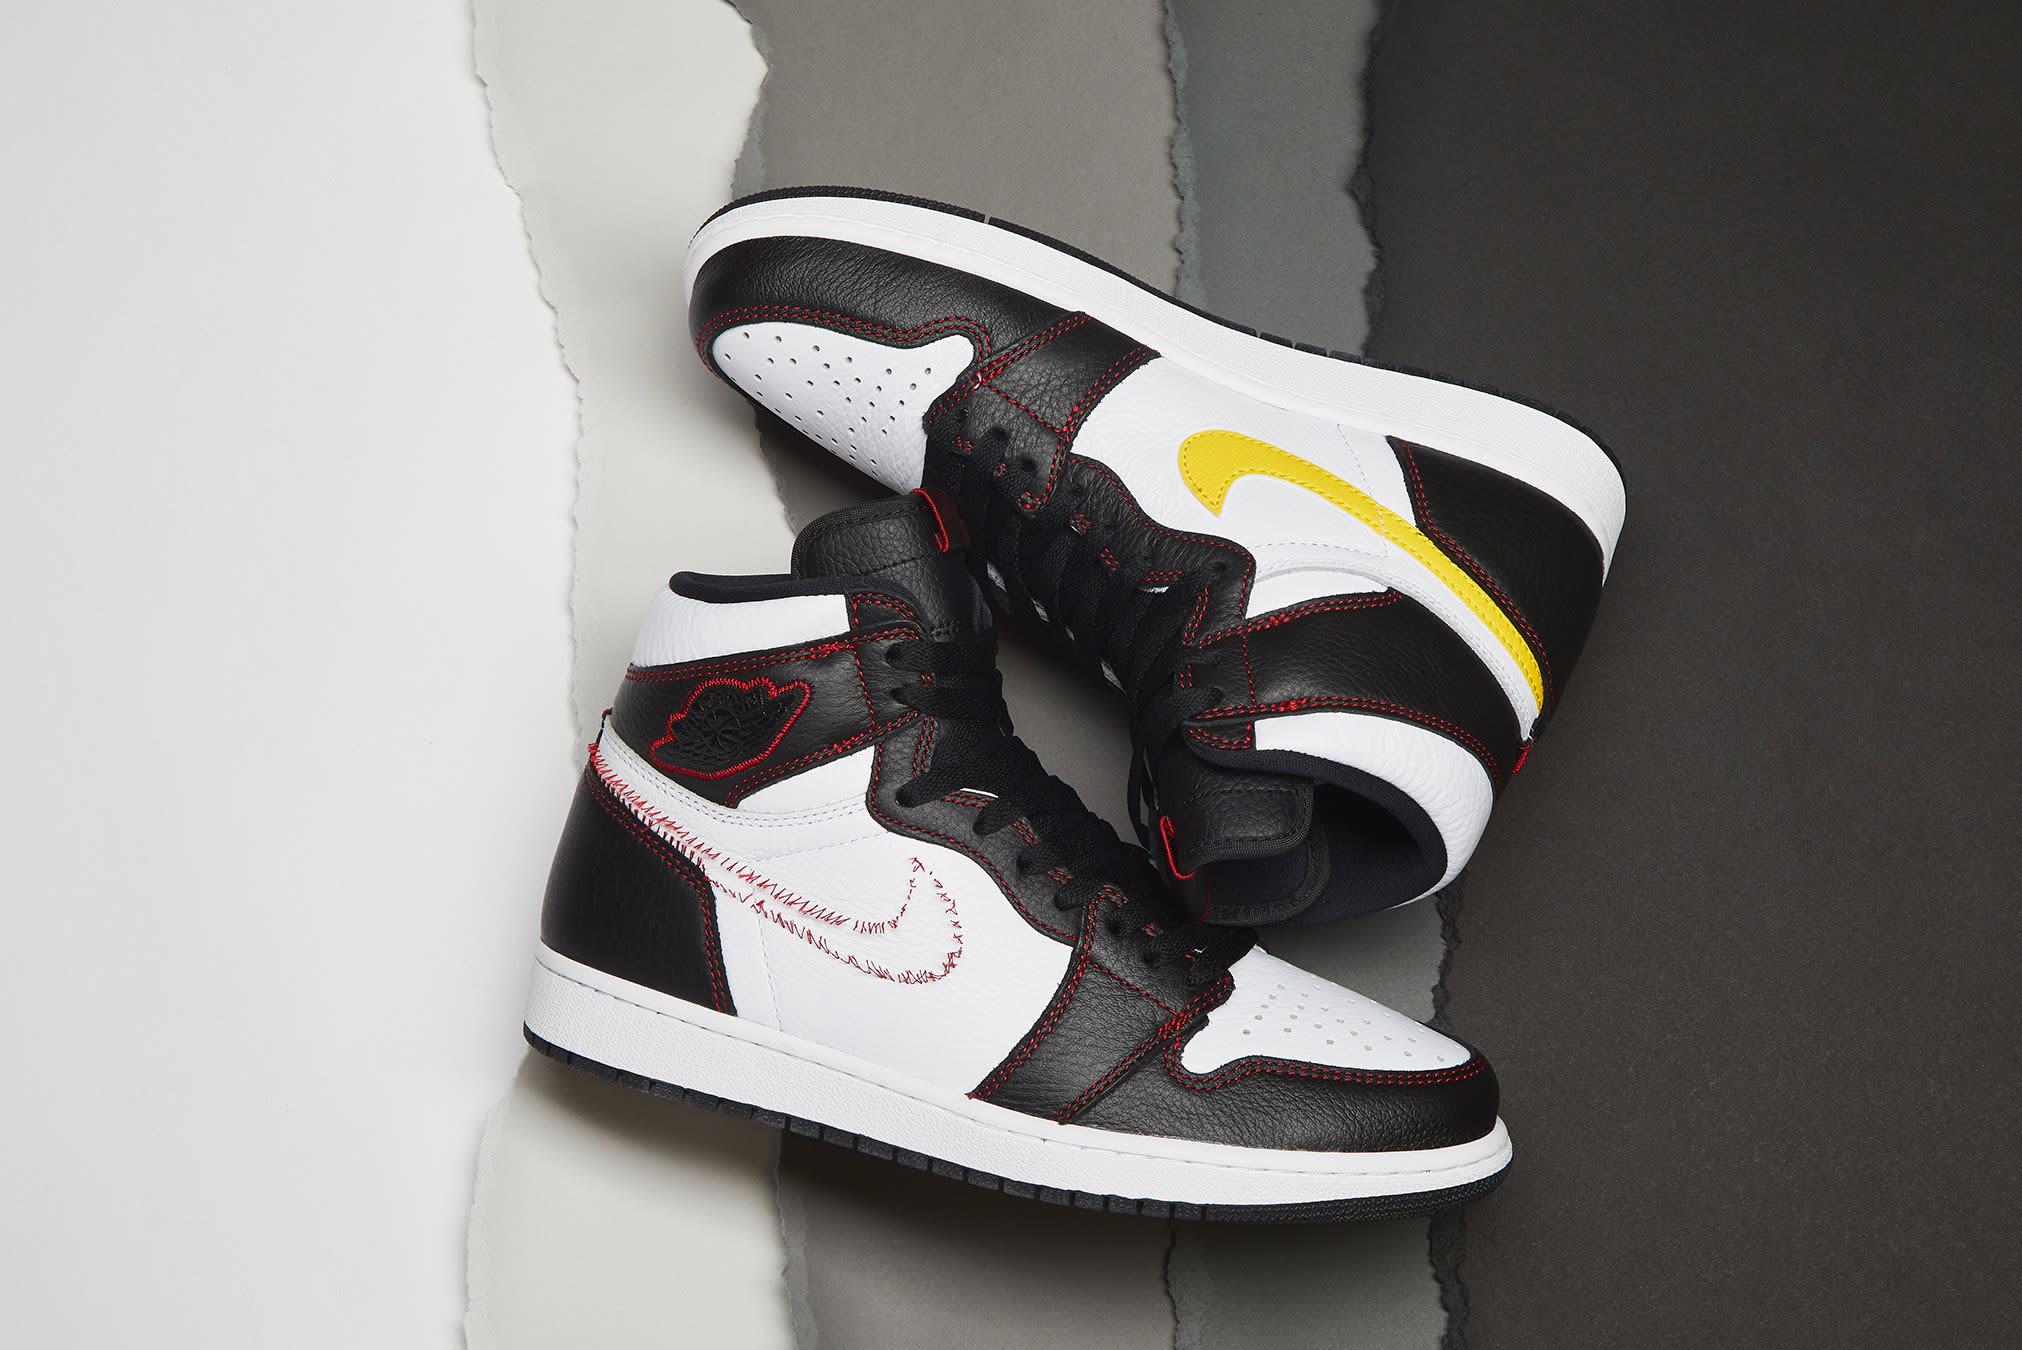 Og High Nike Now Air Register EndLaunches Jordan 1 On YbgyIfv76